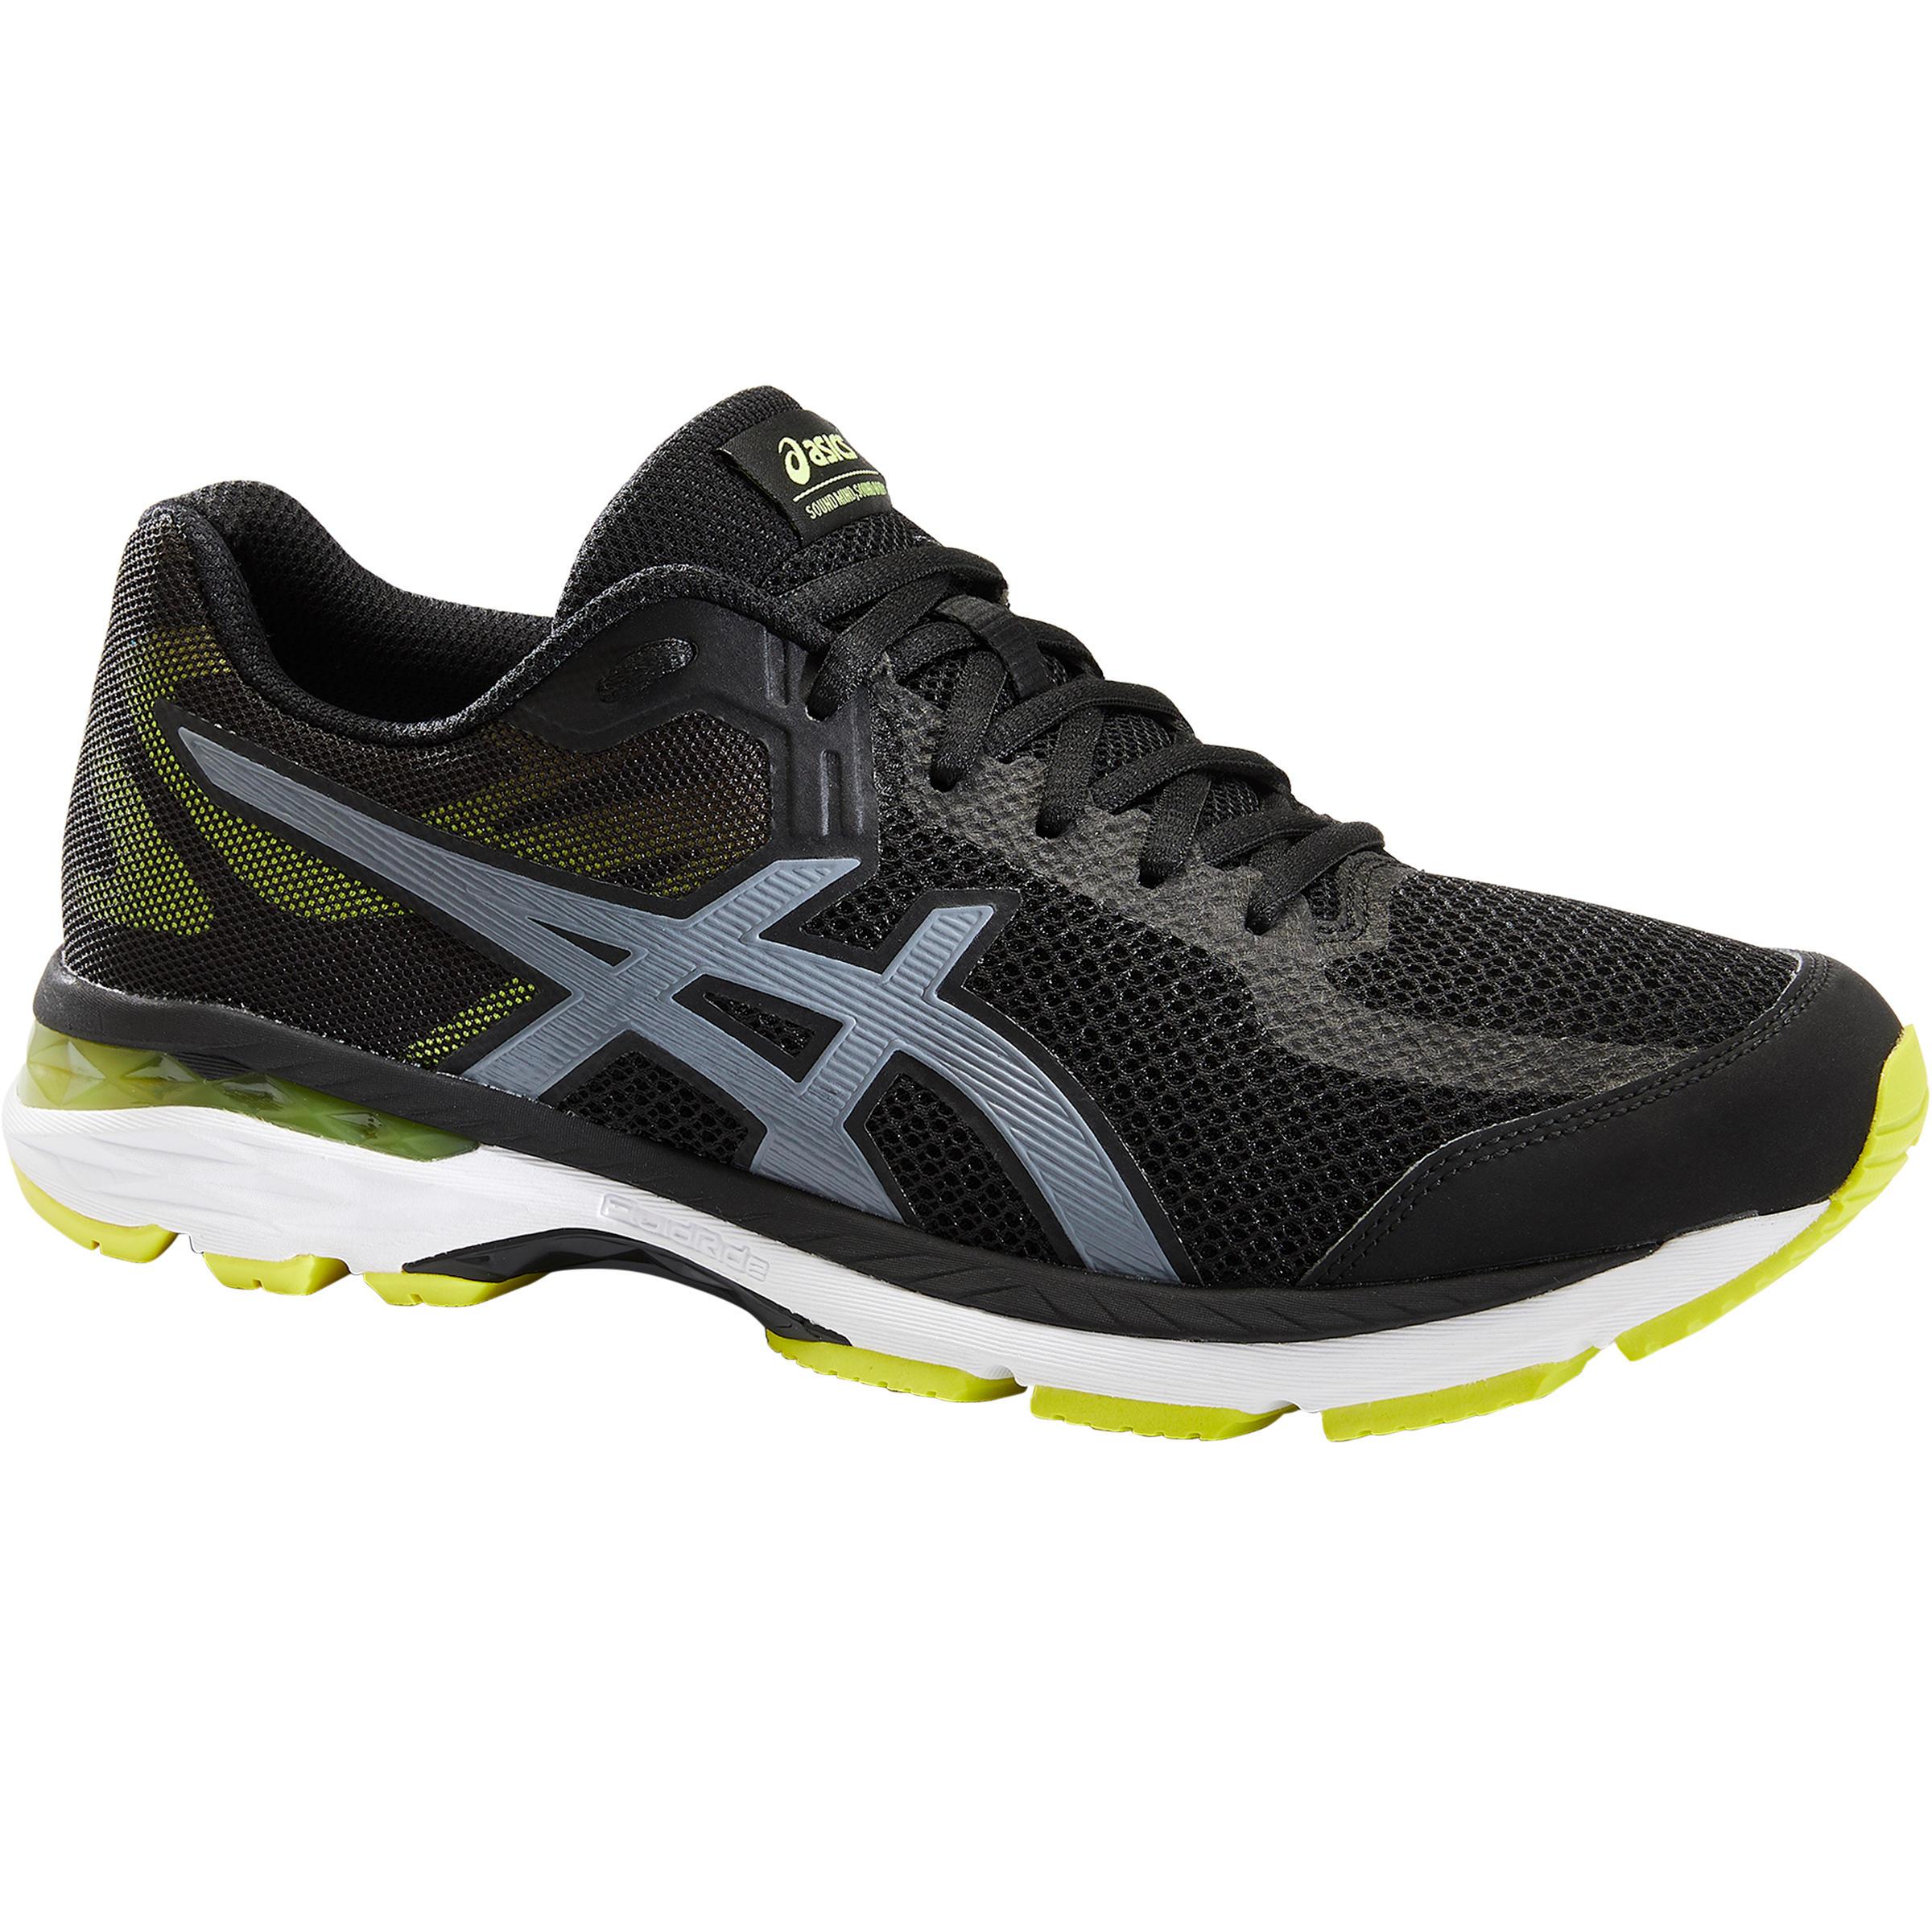 Men's Running Shoe Gel Glyde - Black